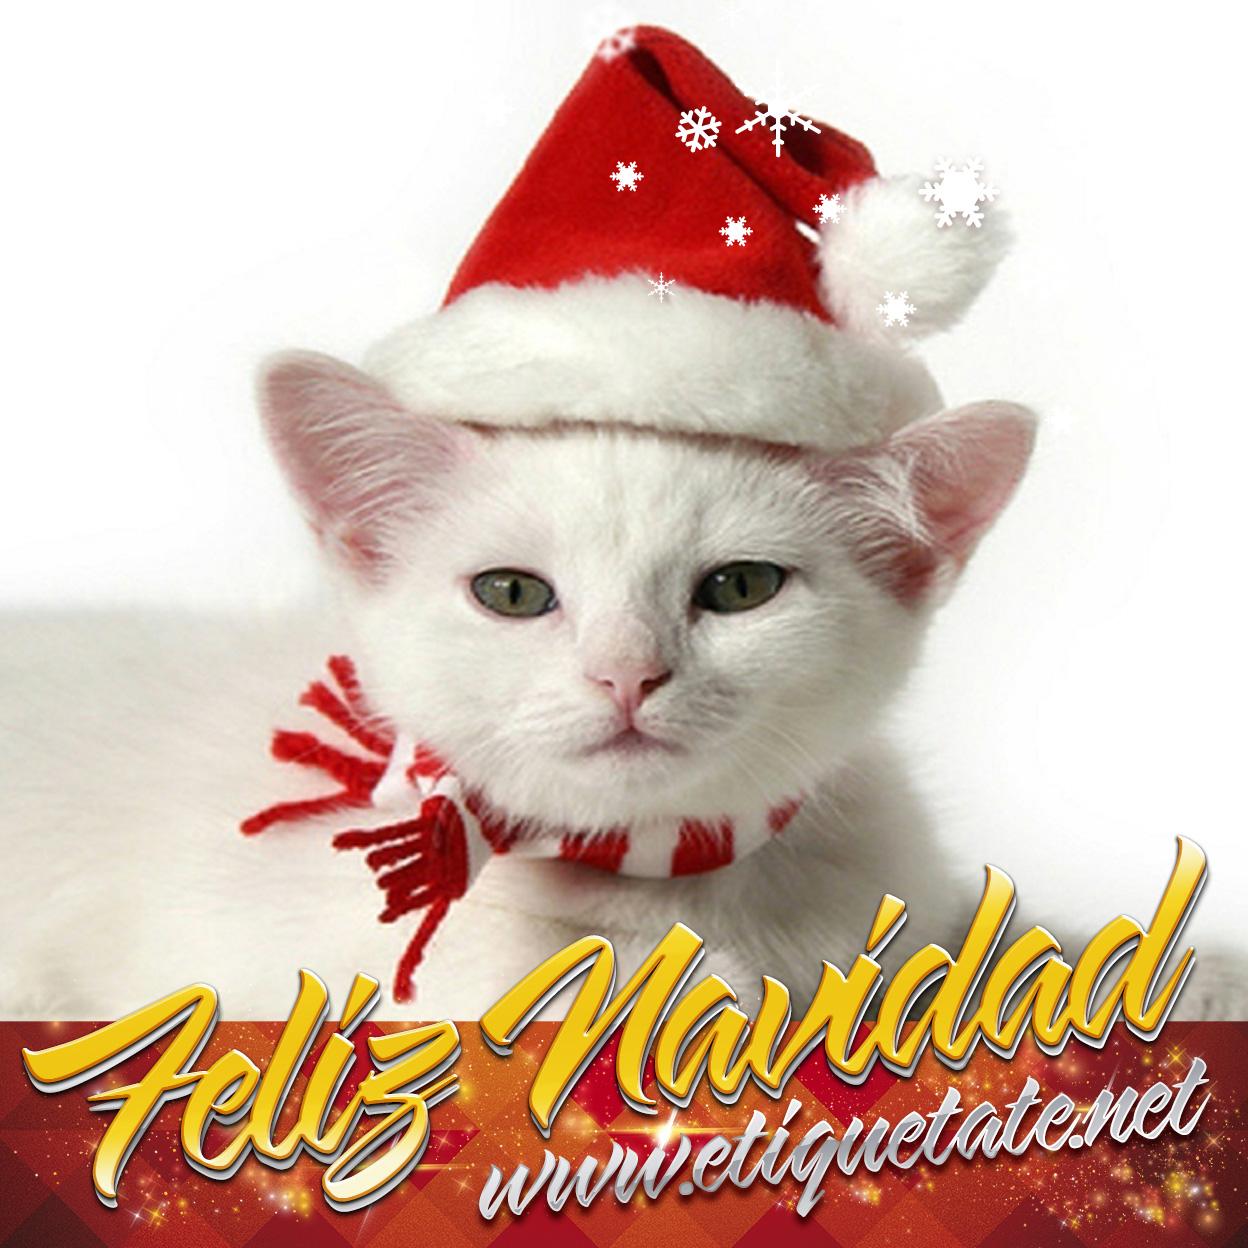 Imagenes Whatsapp Navidad - Fotos para Whatsapp